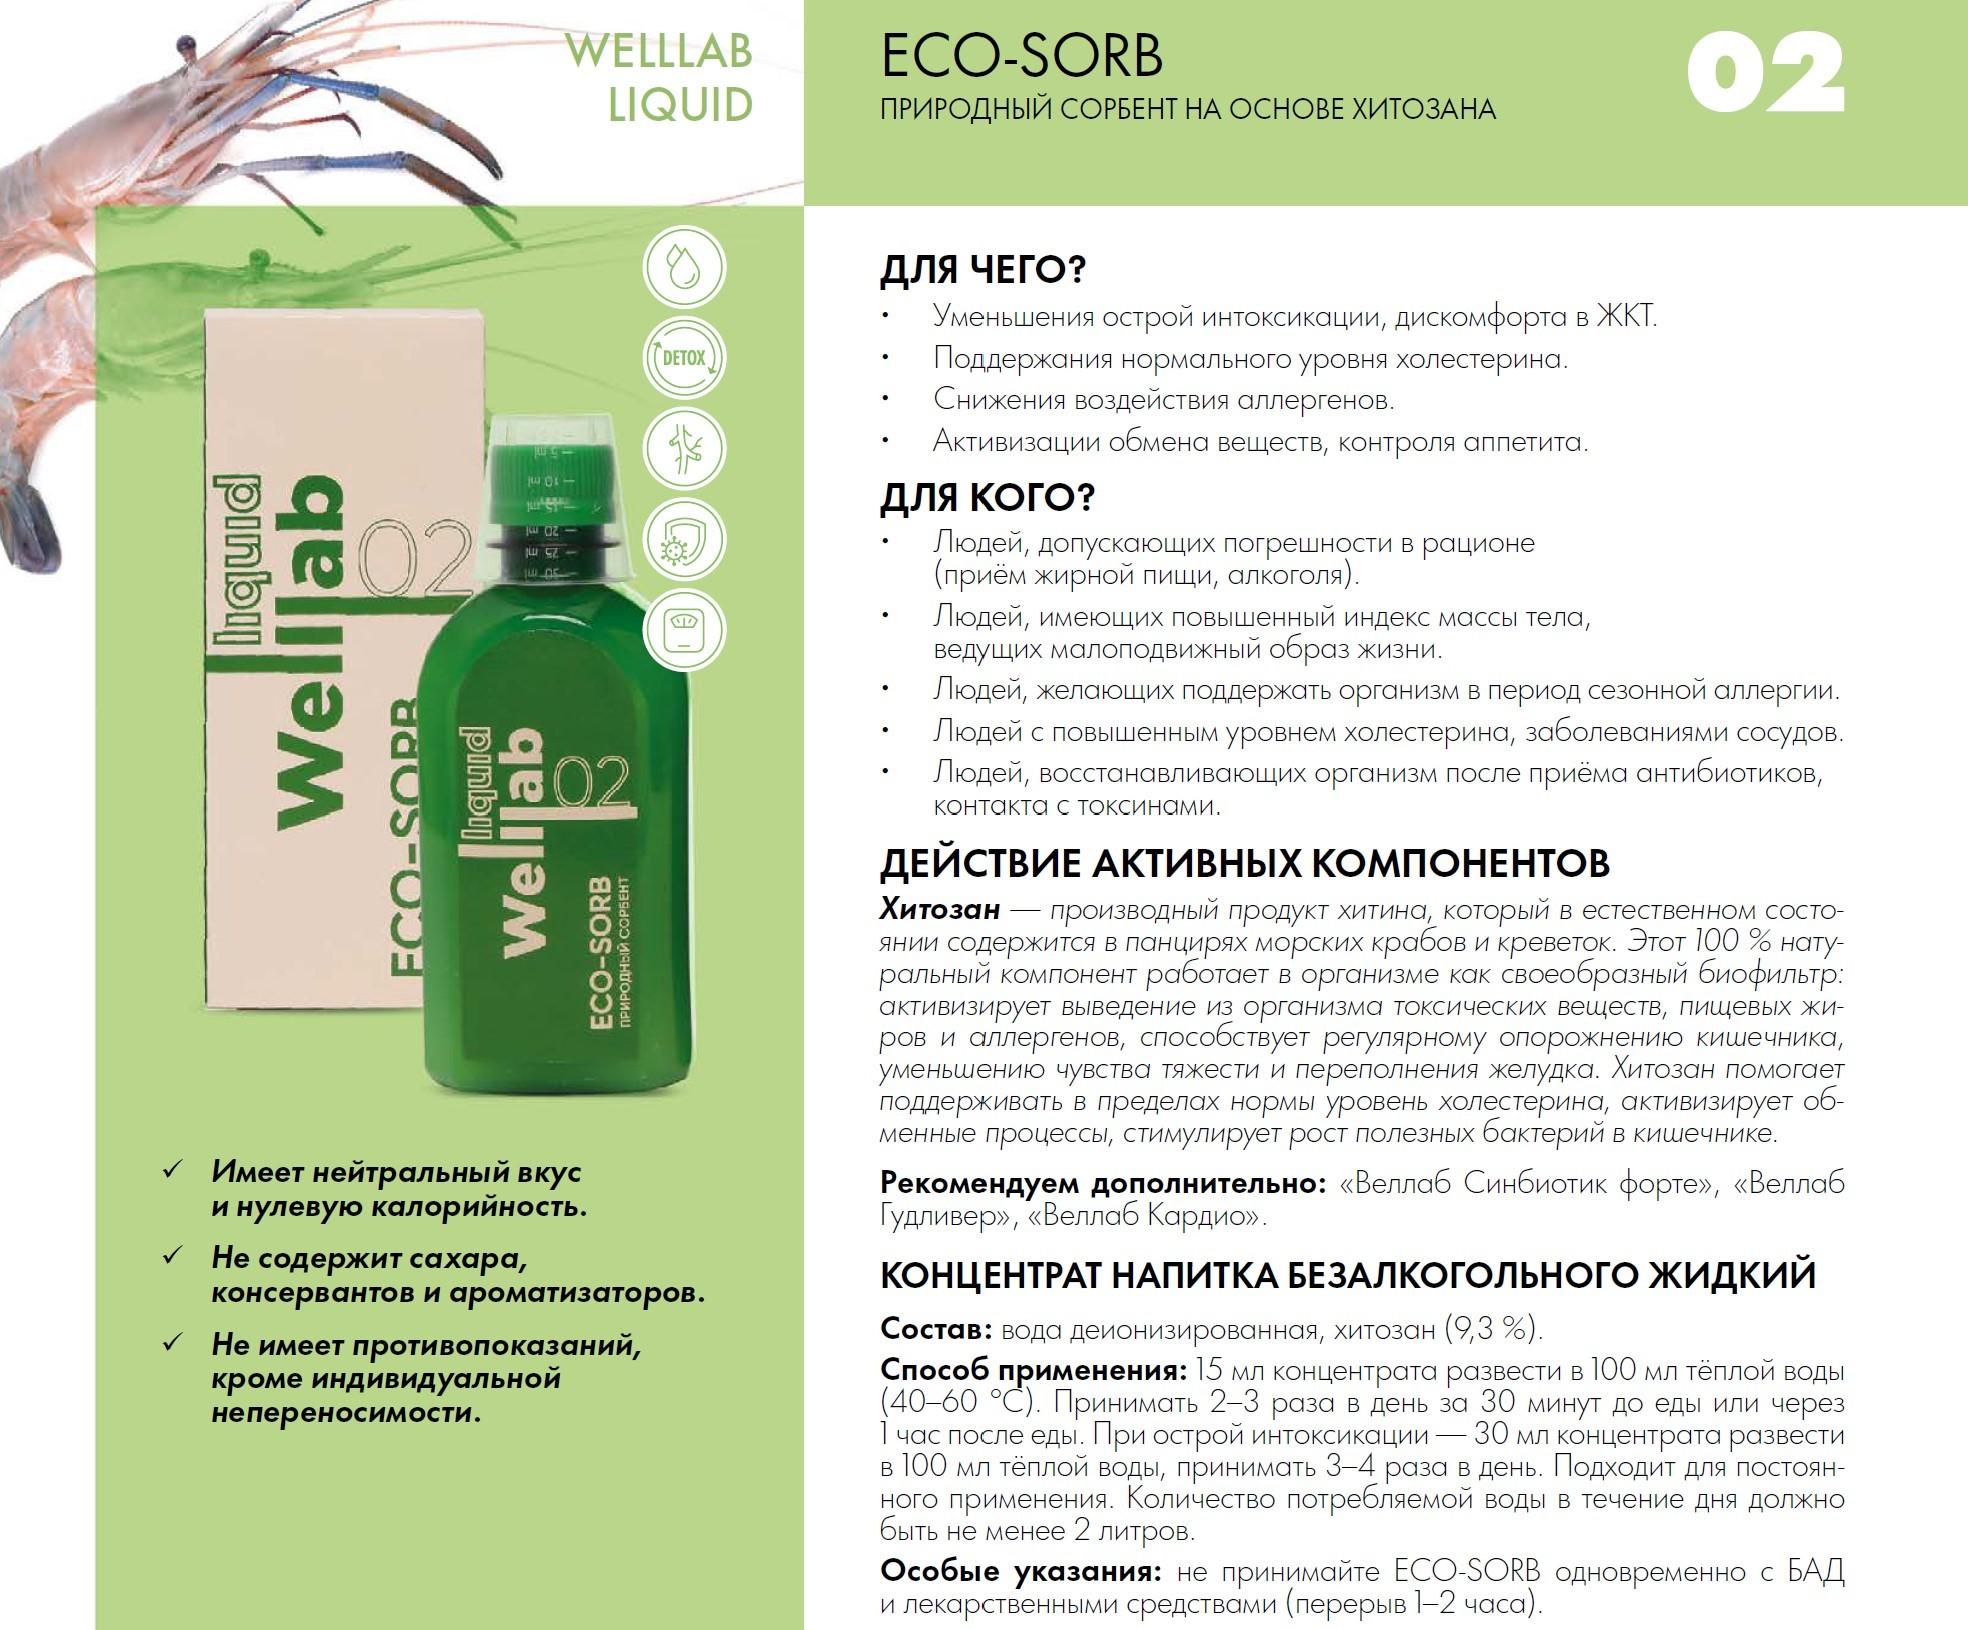 Welllab liquid ECO-SORB